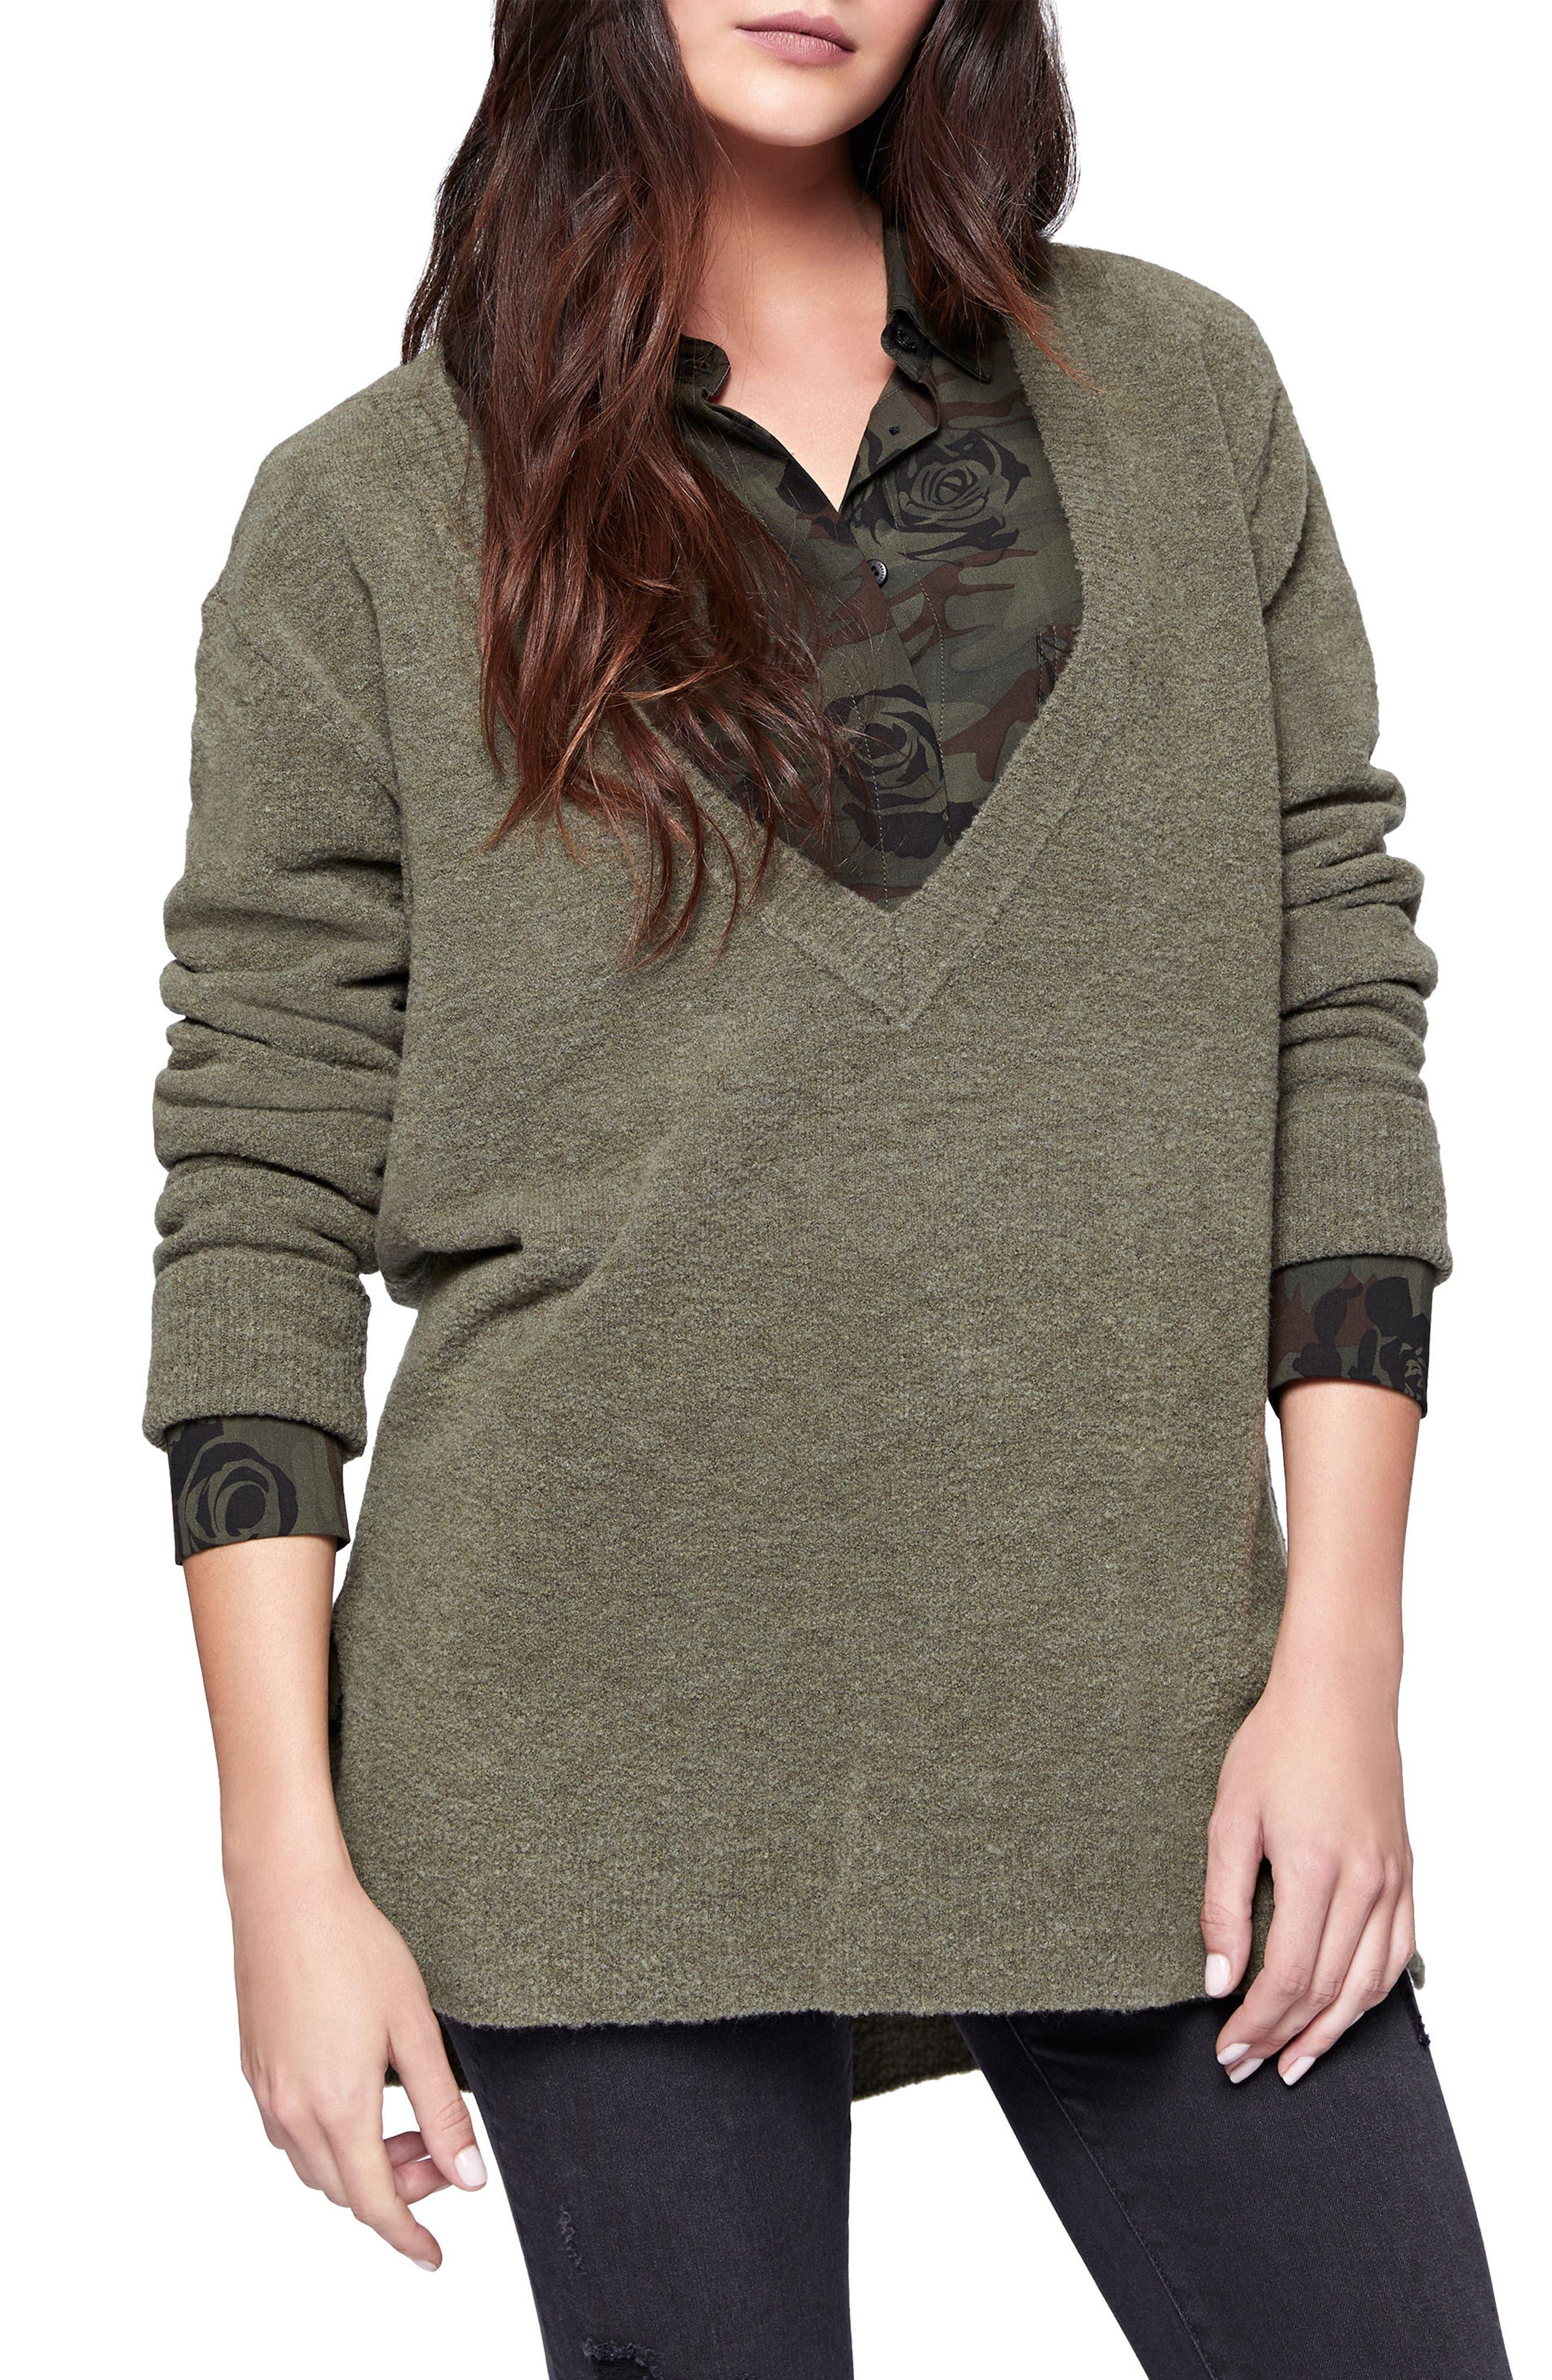 Santuary Delancey V-Neck Sweater,                         Main,                         color, Fatigue